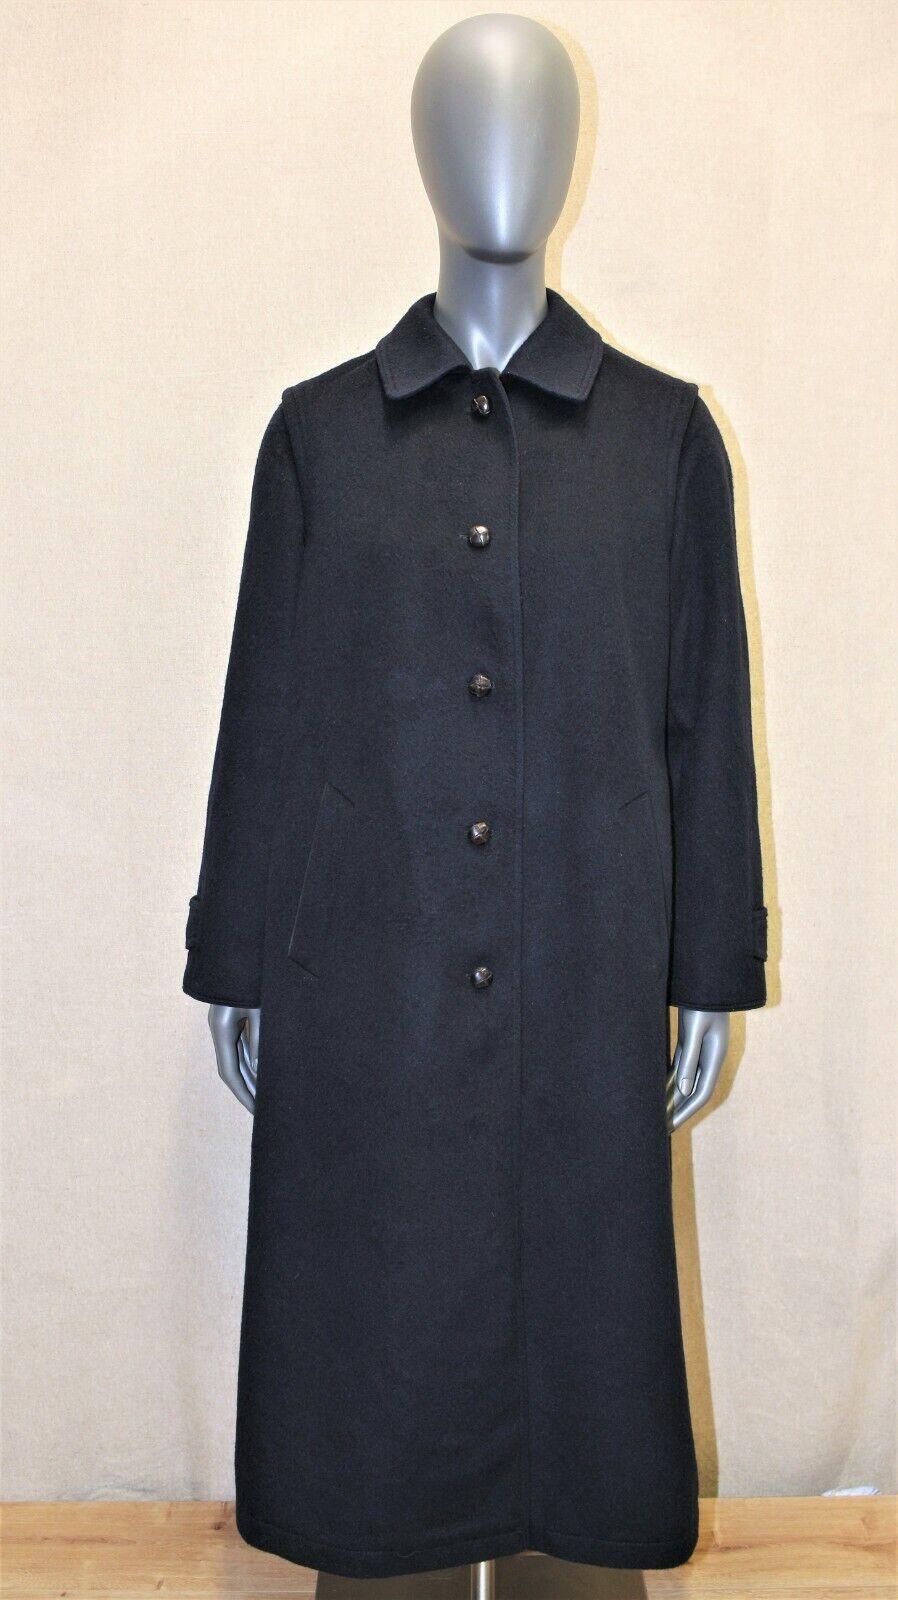 Manteau original loden burberry's vtg 70's laine bleu 12uk 40fr made in austria